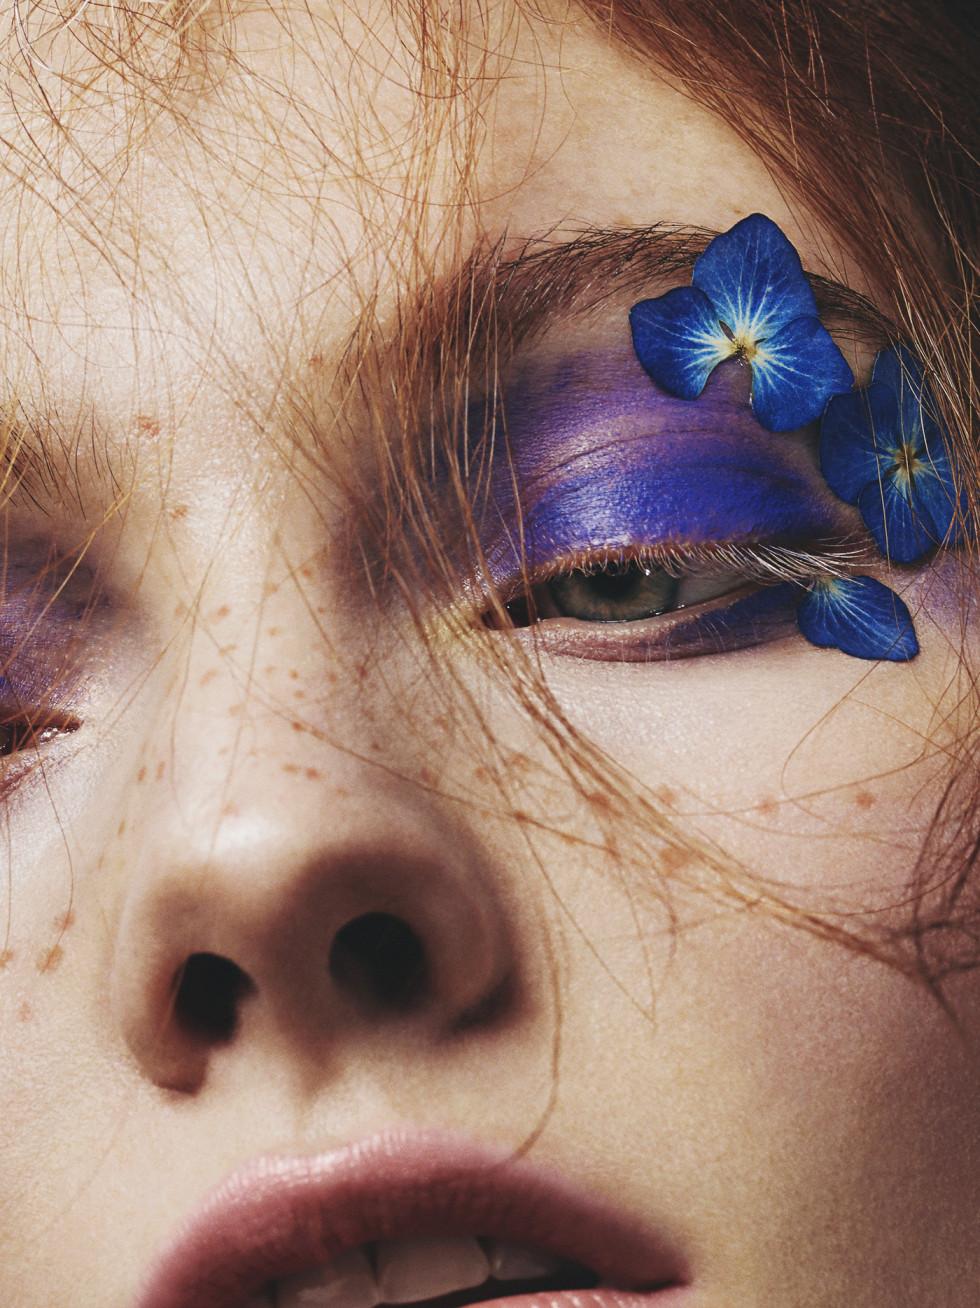 Photography Mike Blackett and makeup artist Scarlett Burton